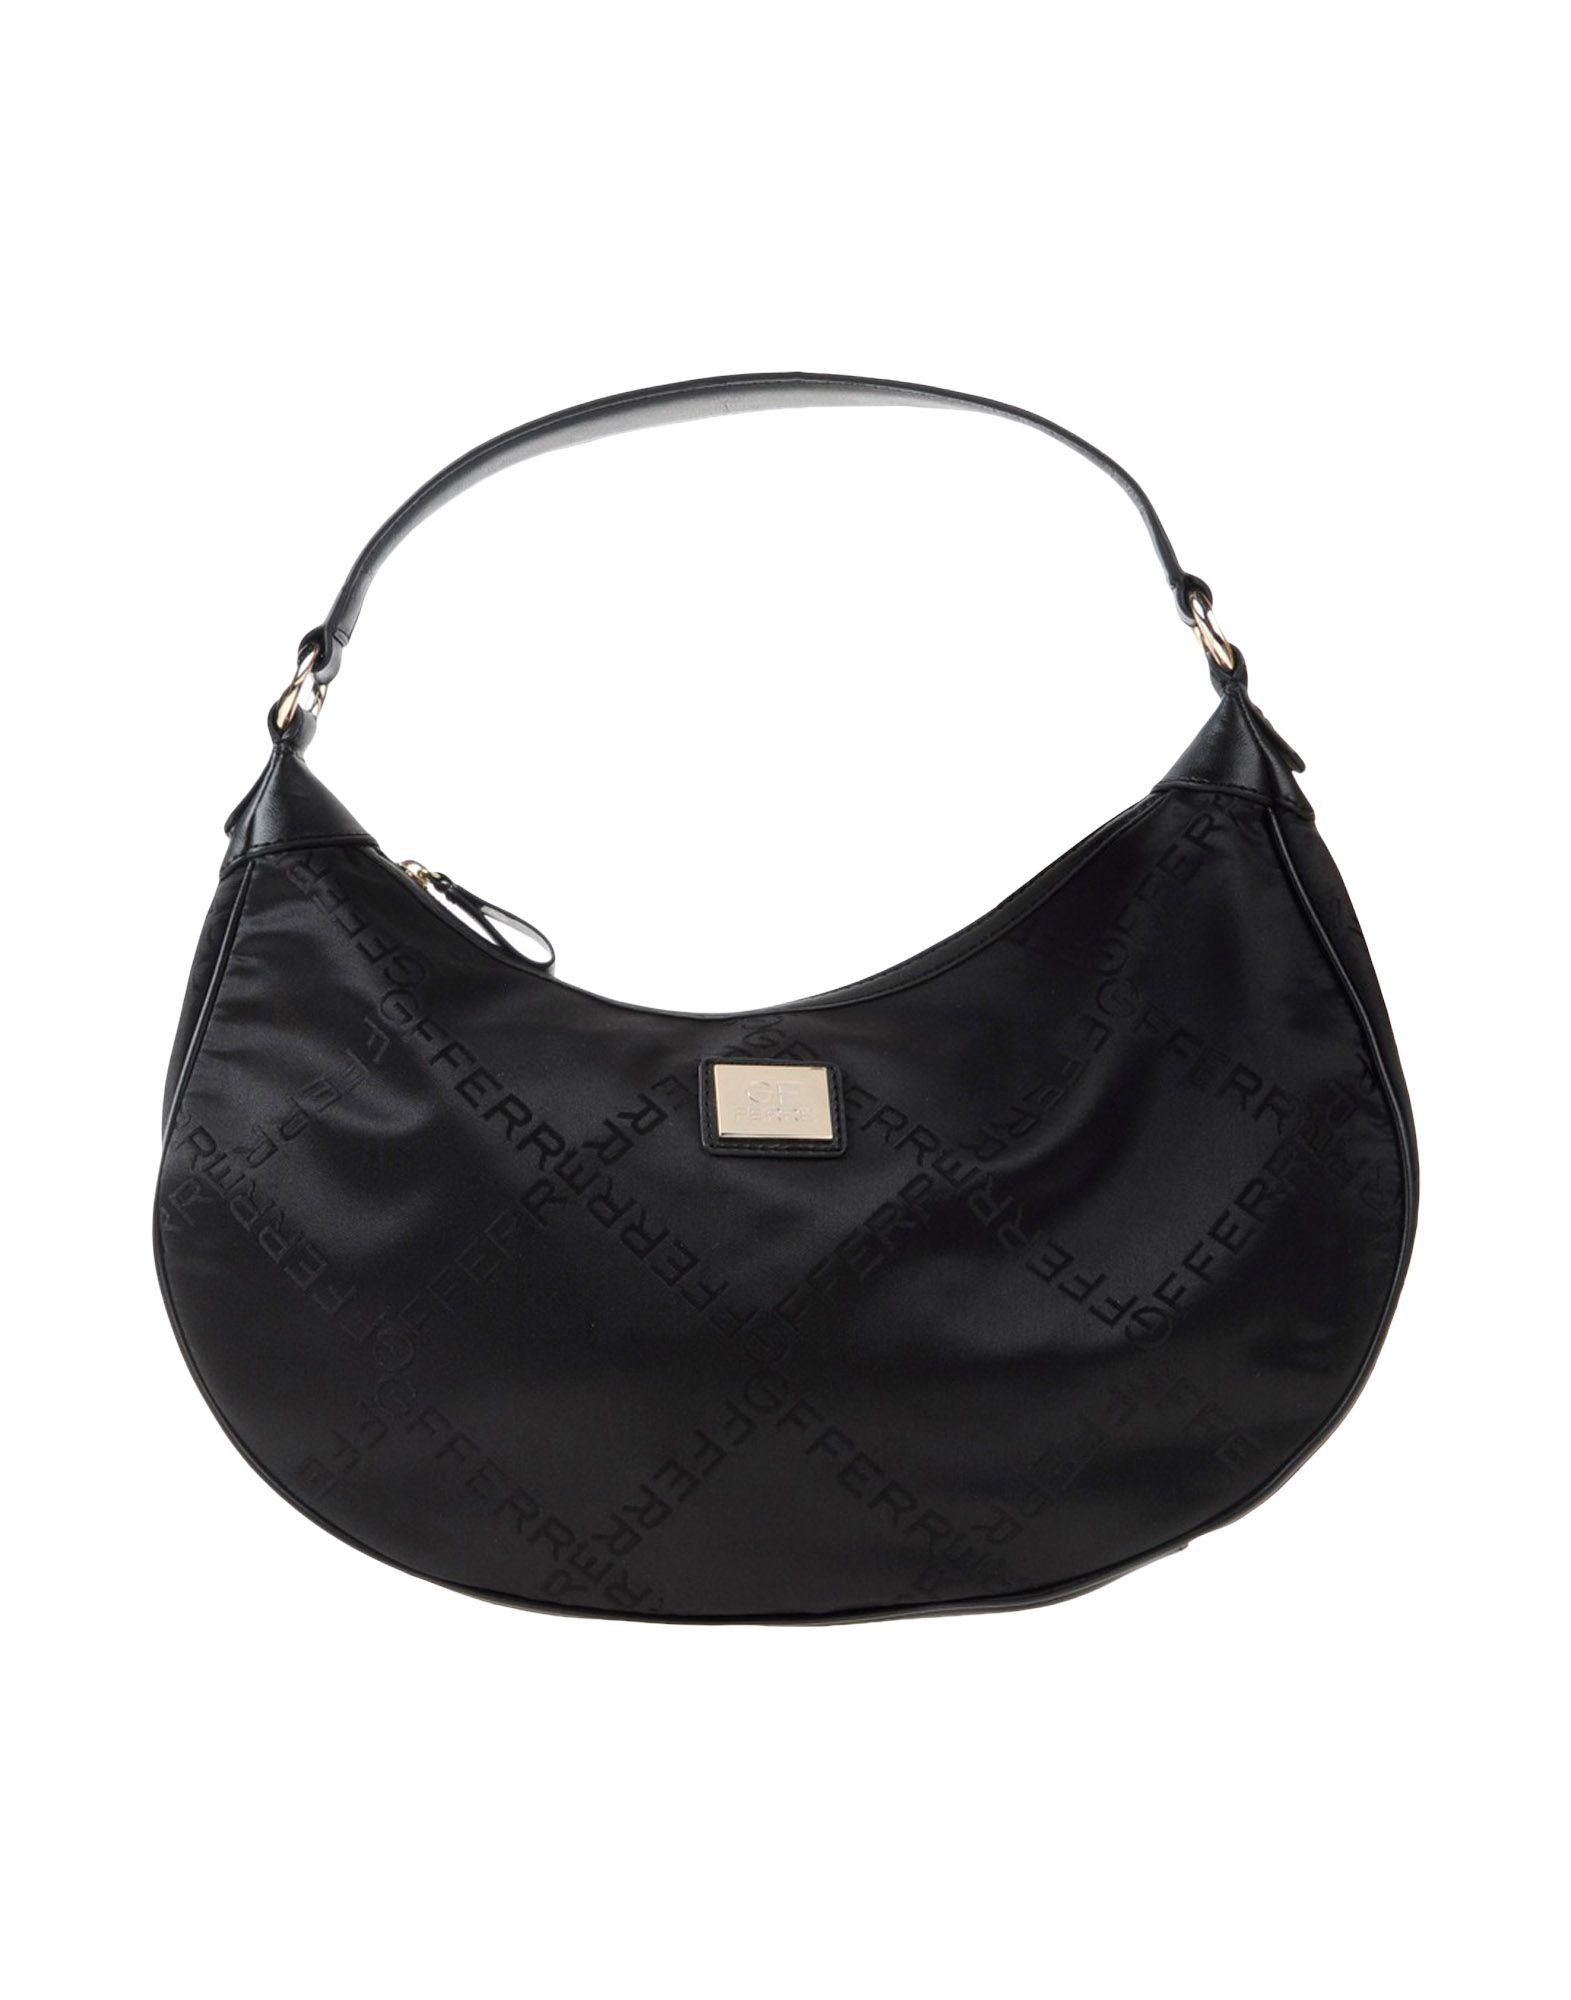 Lyst Gianfranco Ferré Handbag In Black